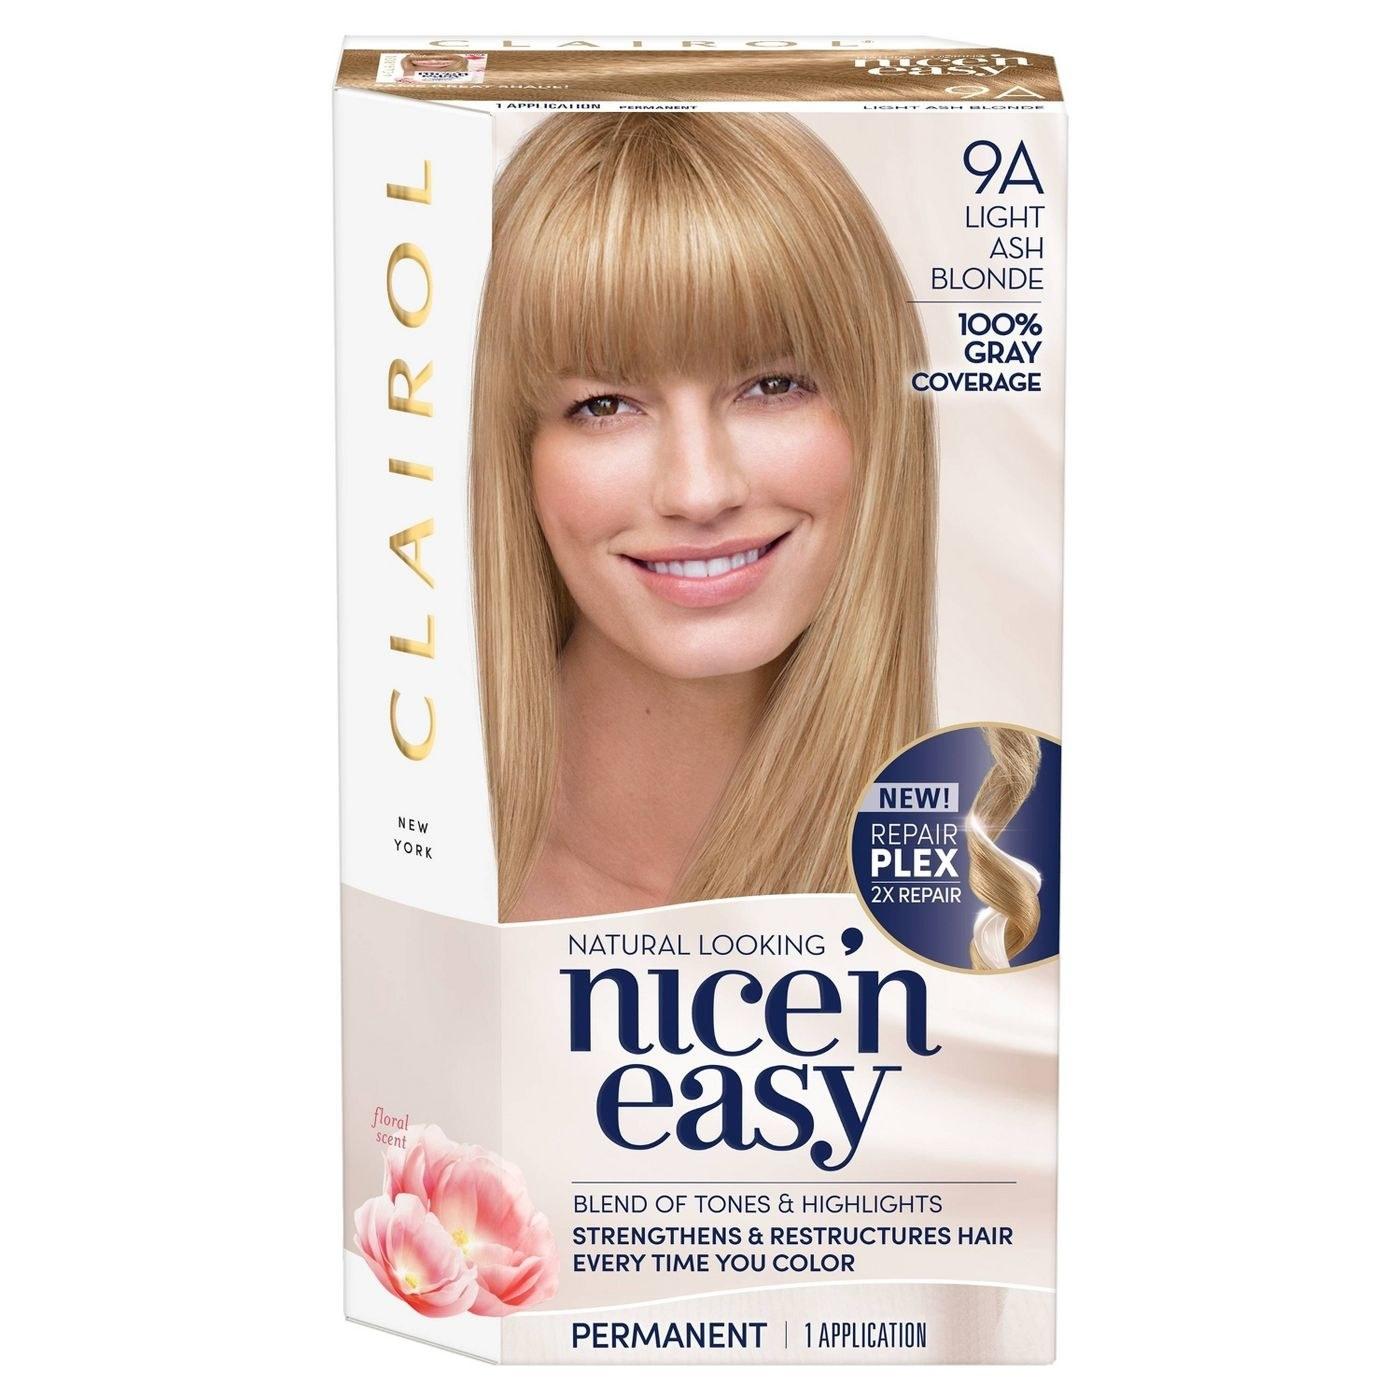 A box of Clarol Nice'n Easy hair color